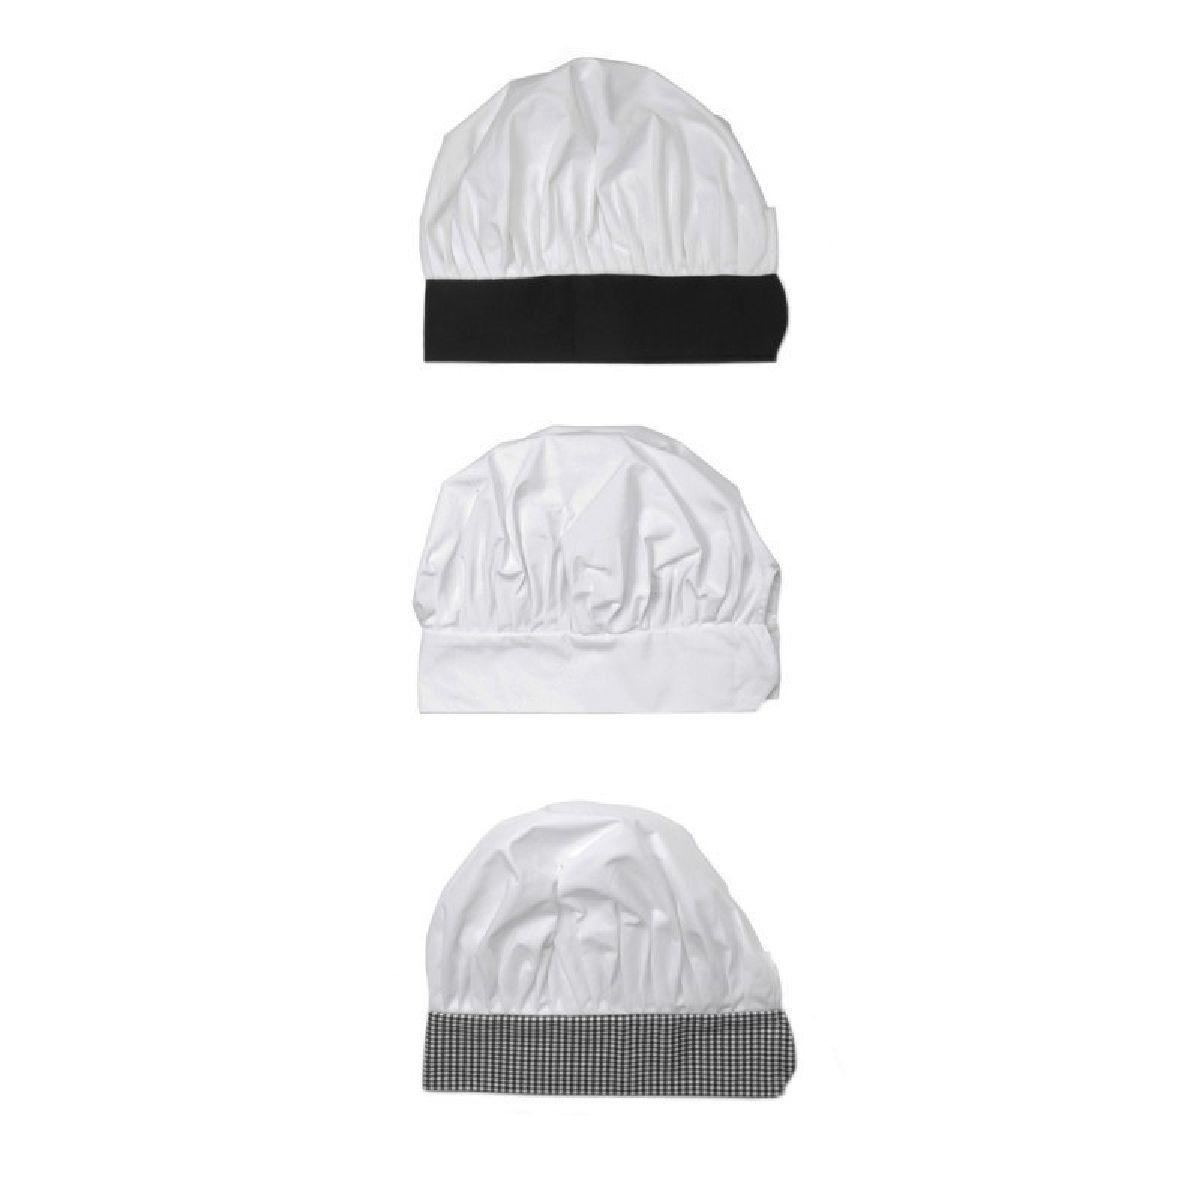 Kitchen Hats